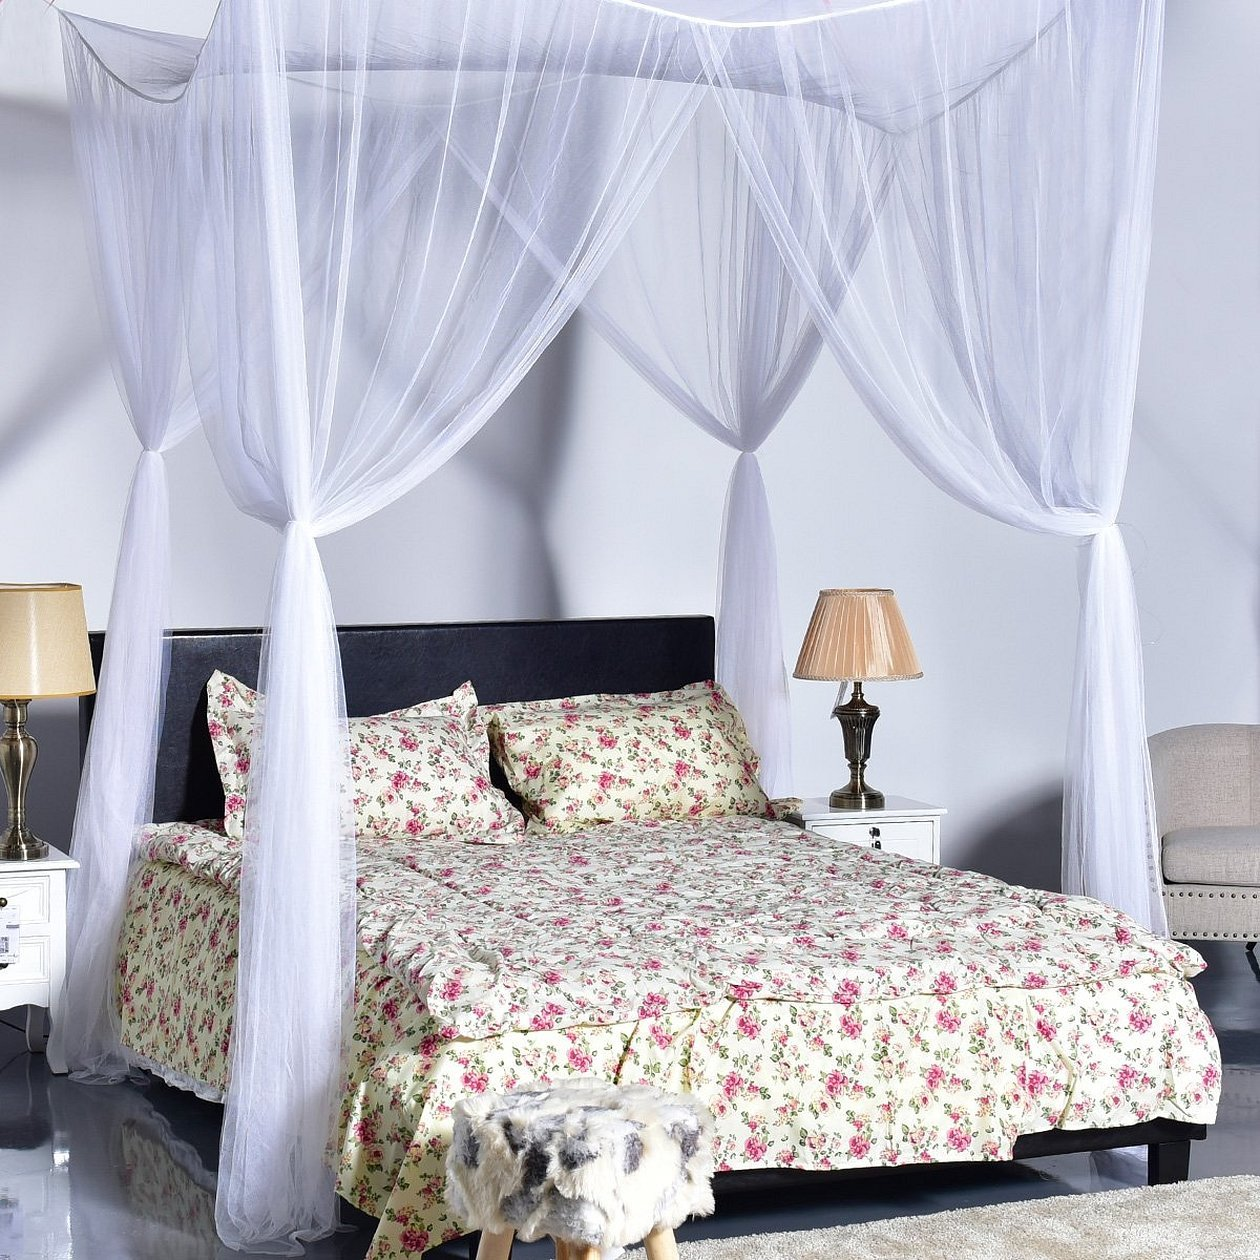 Кровать с балдахином с шторами нити